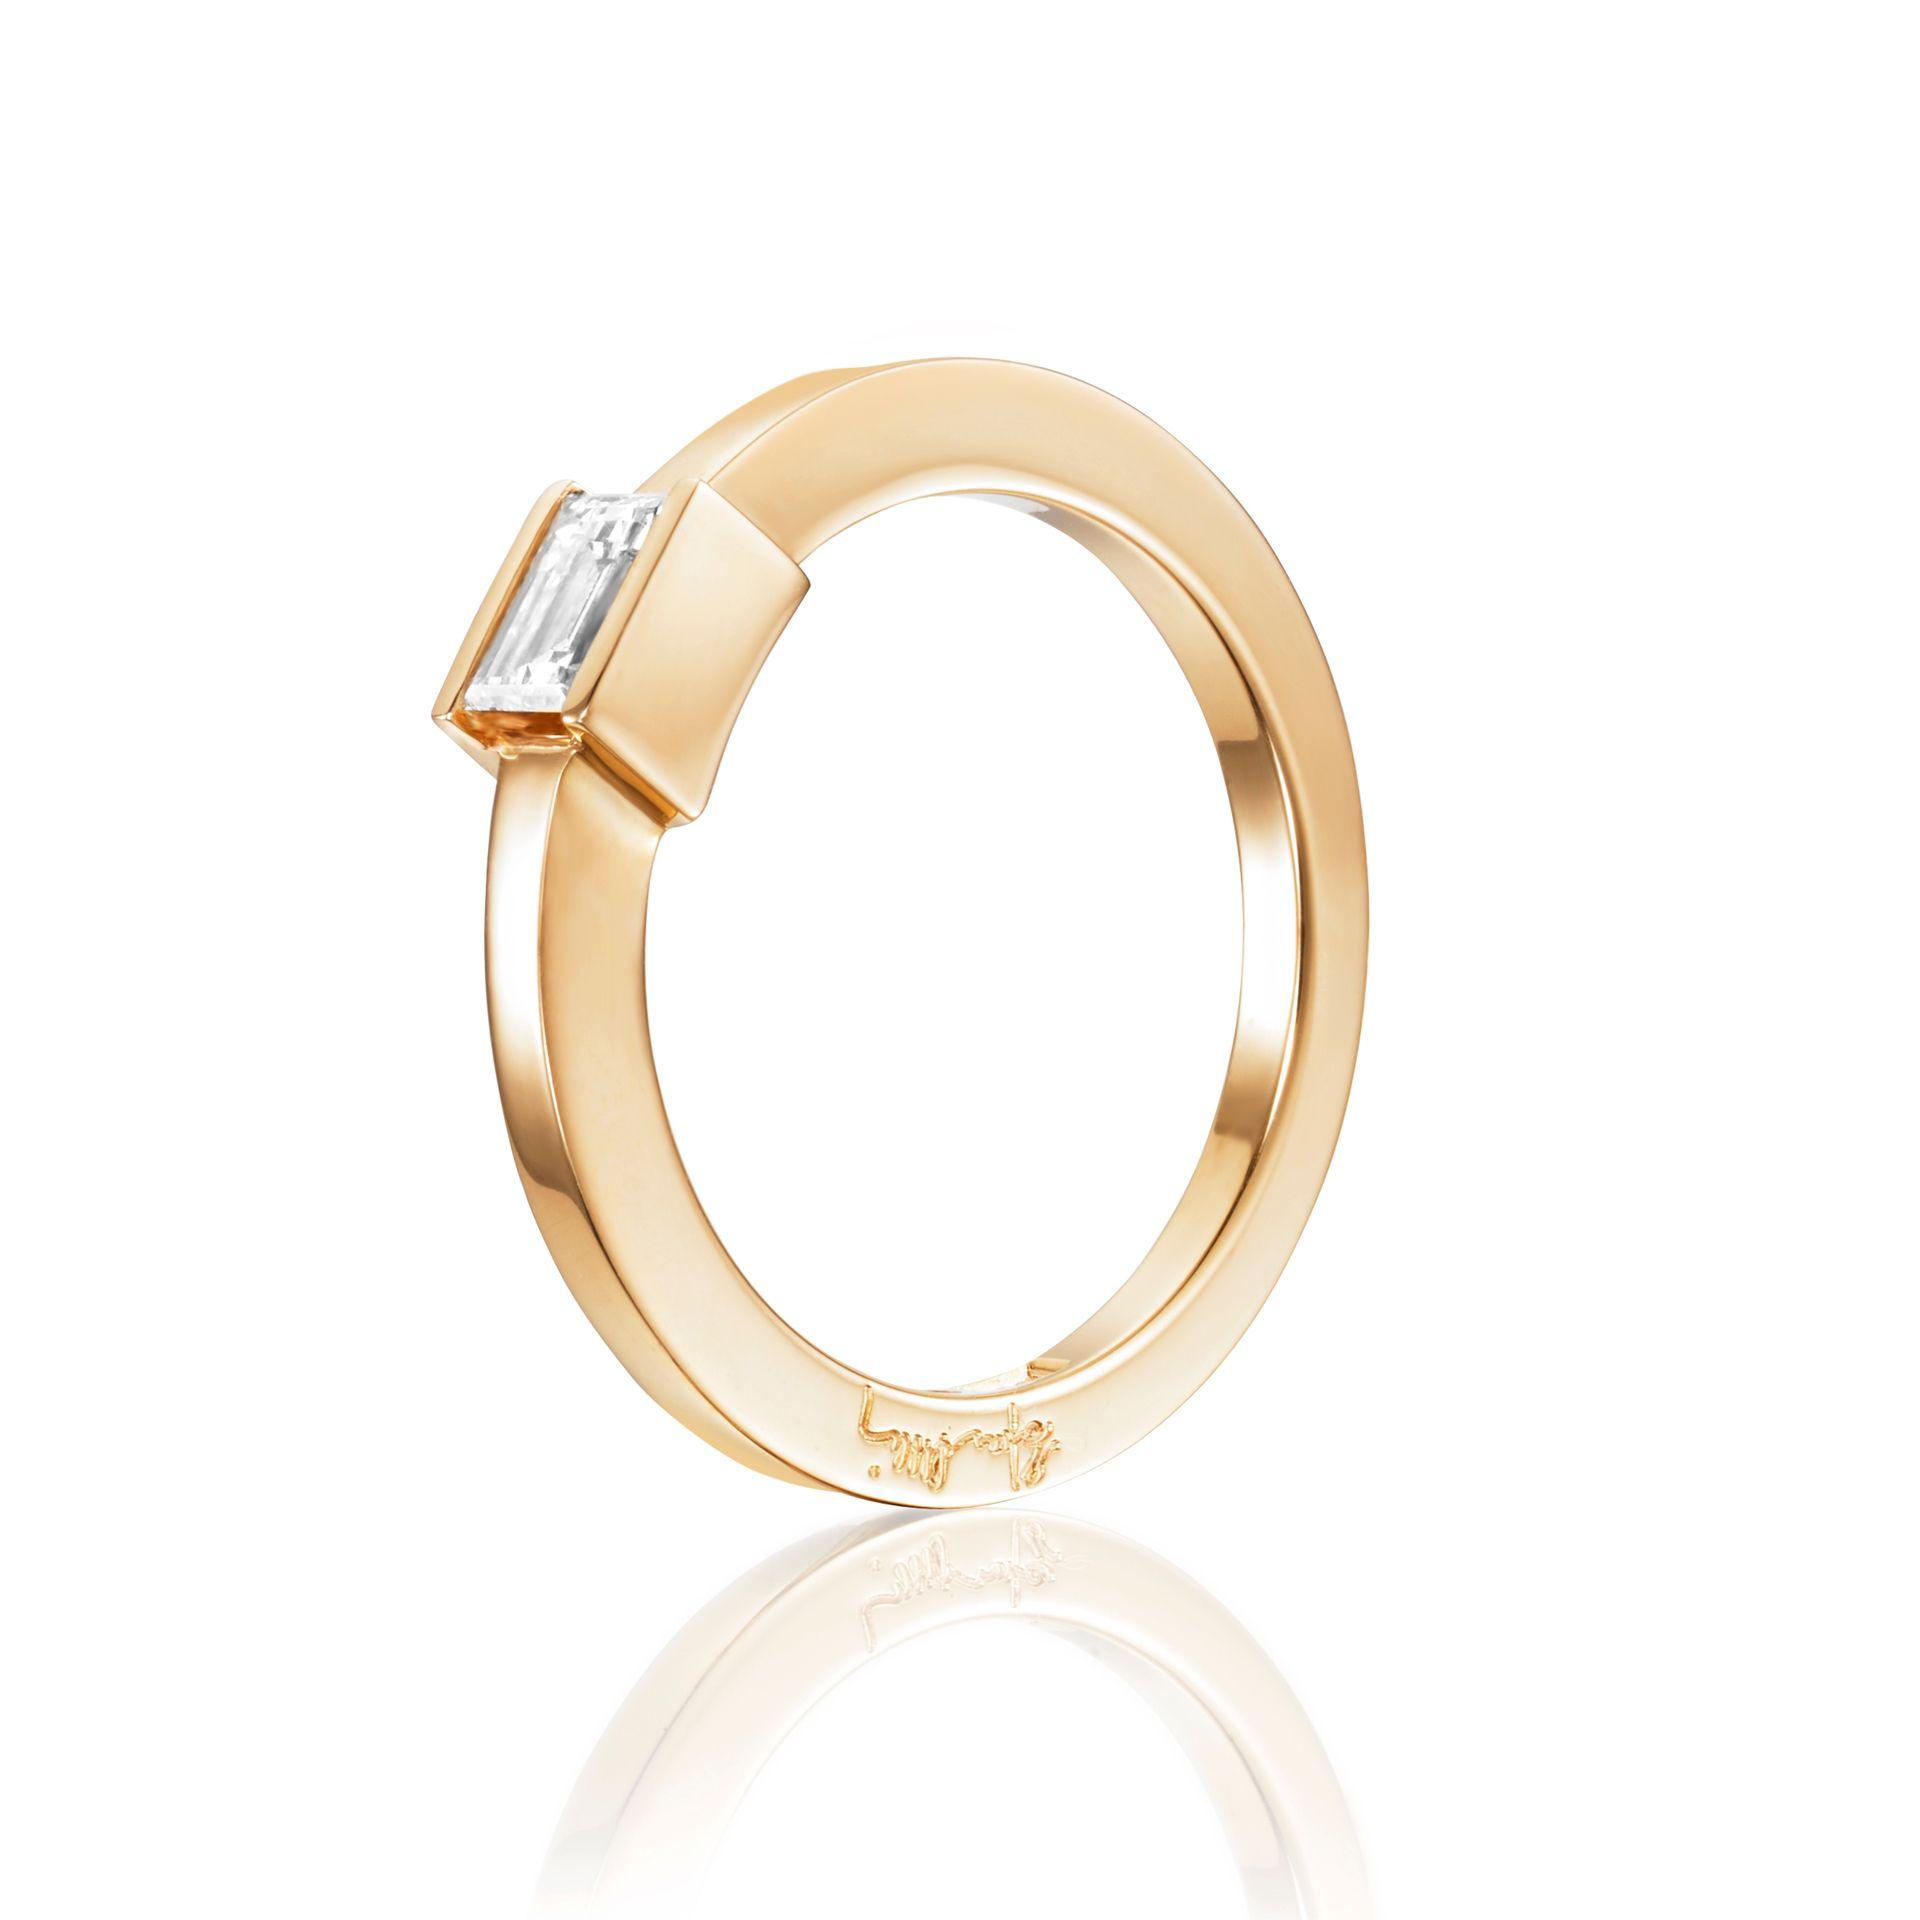 DECO WEDDING RING